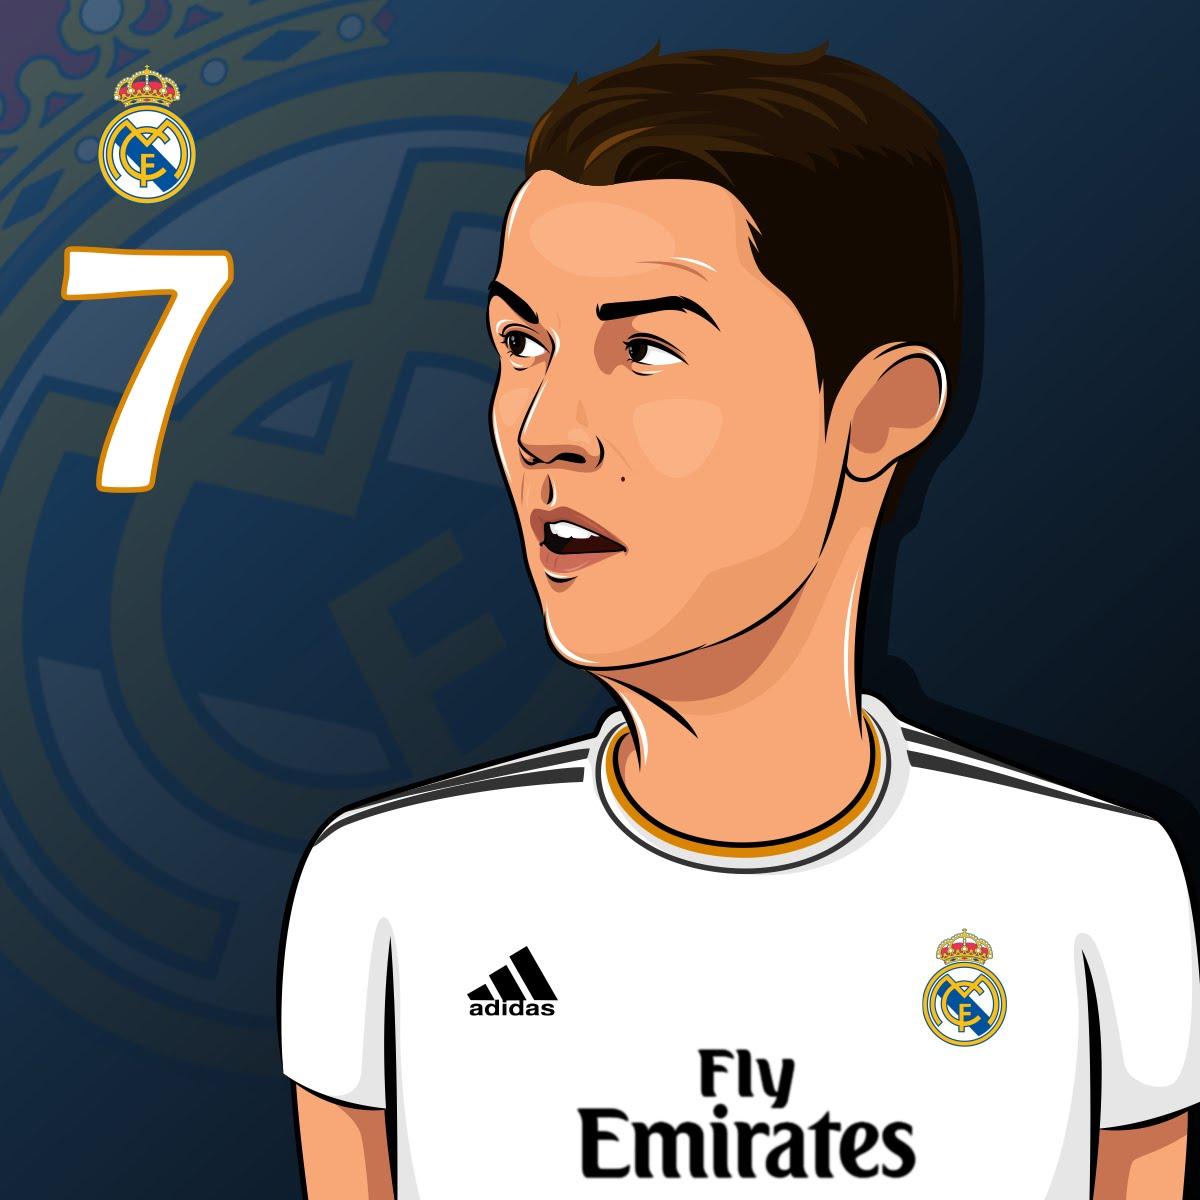 1200x1200 How To Draw Simple Cartoon Cristiano Ronaldo